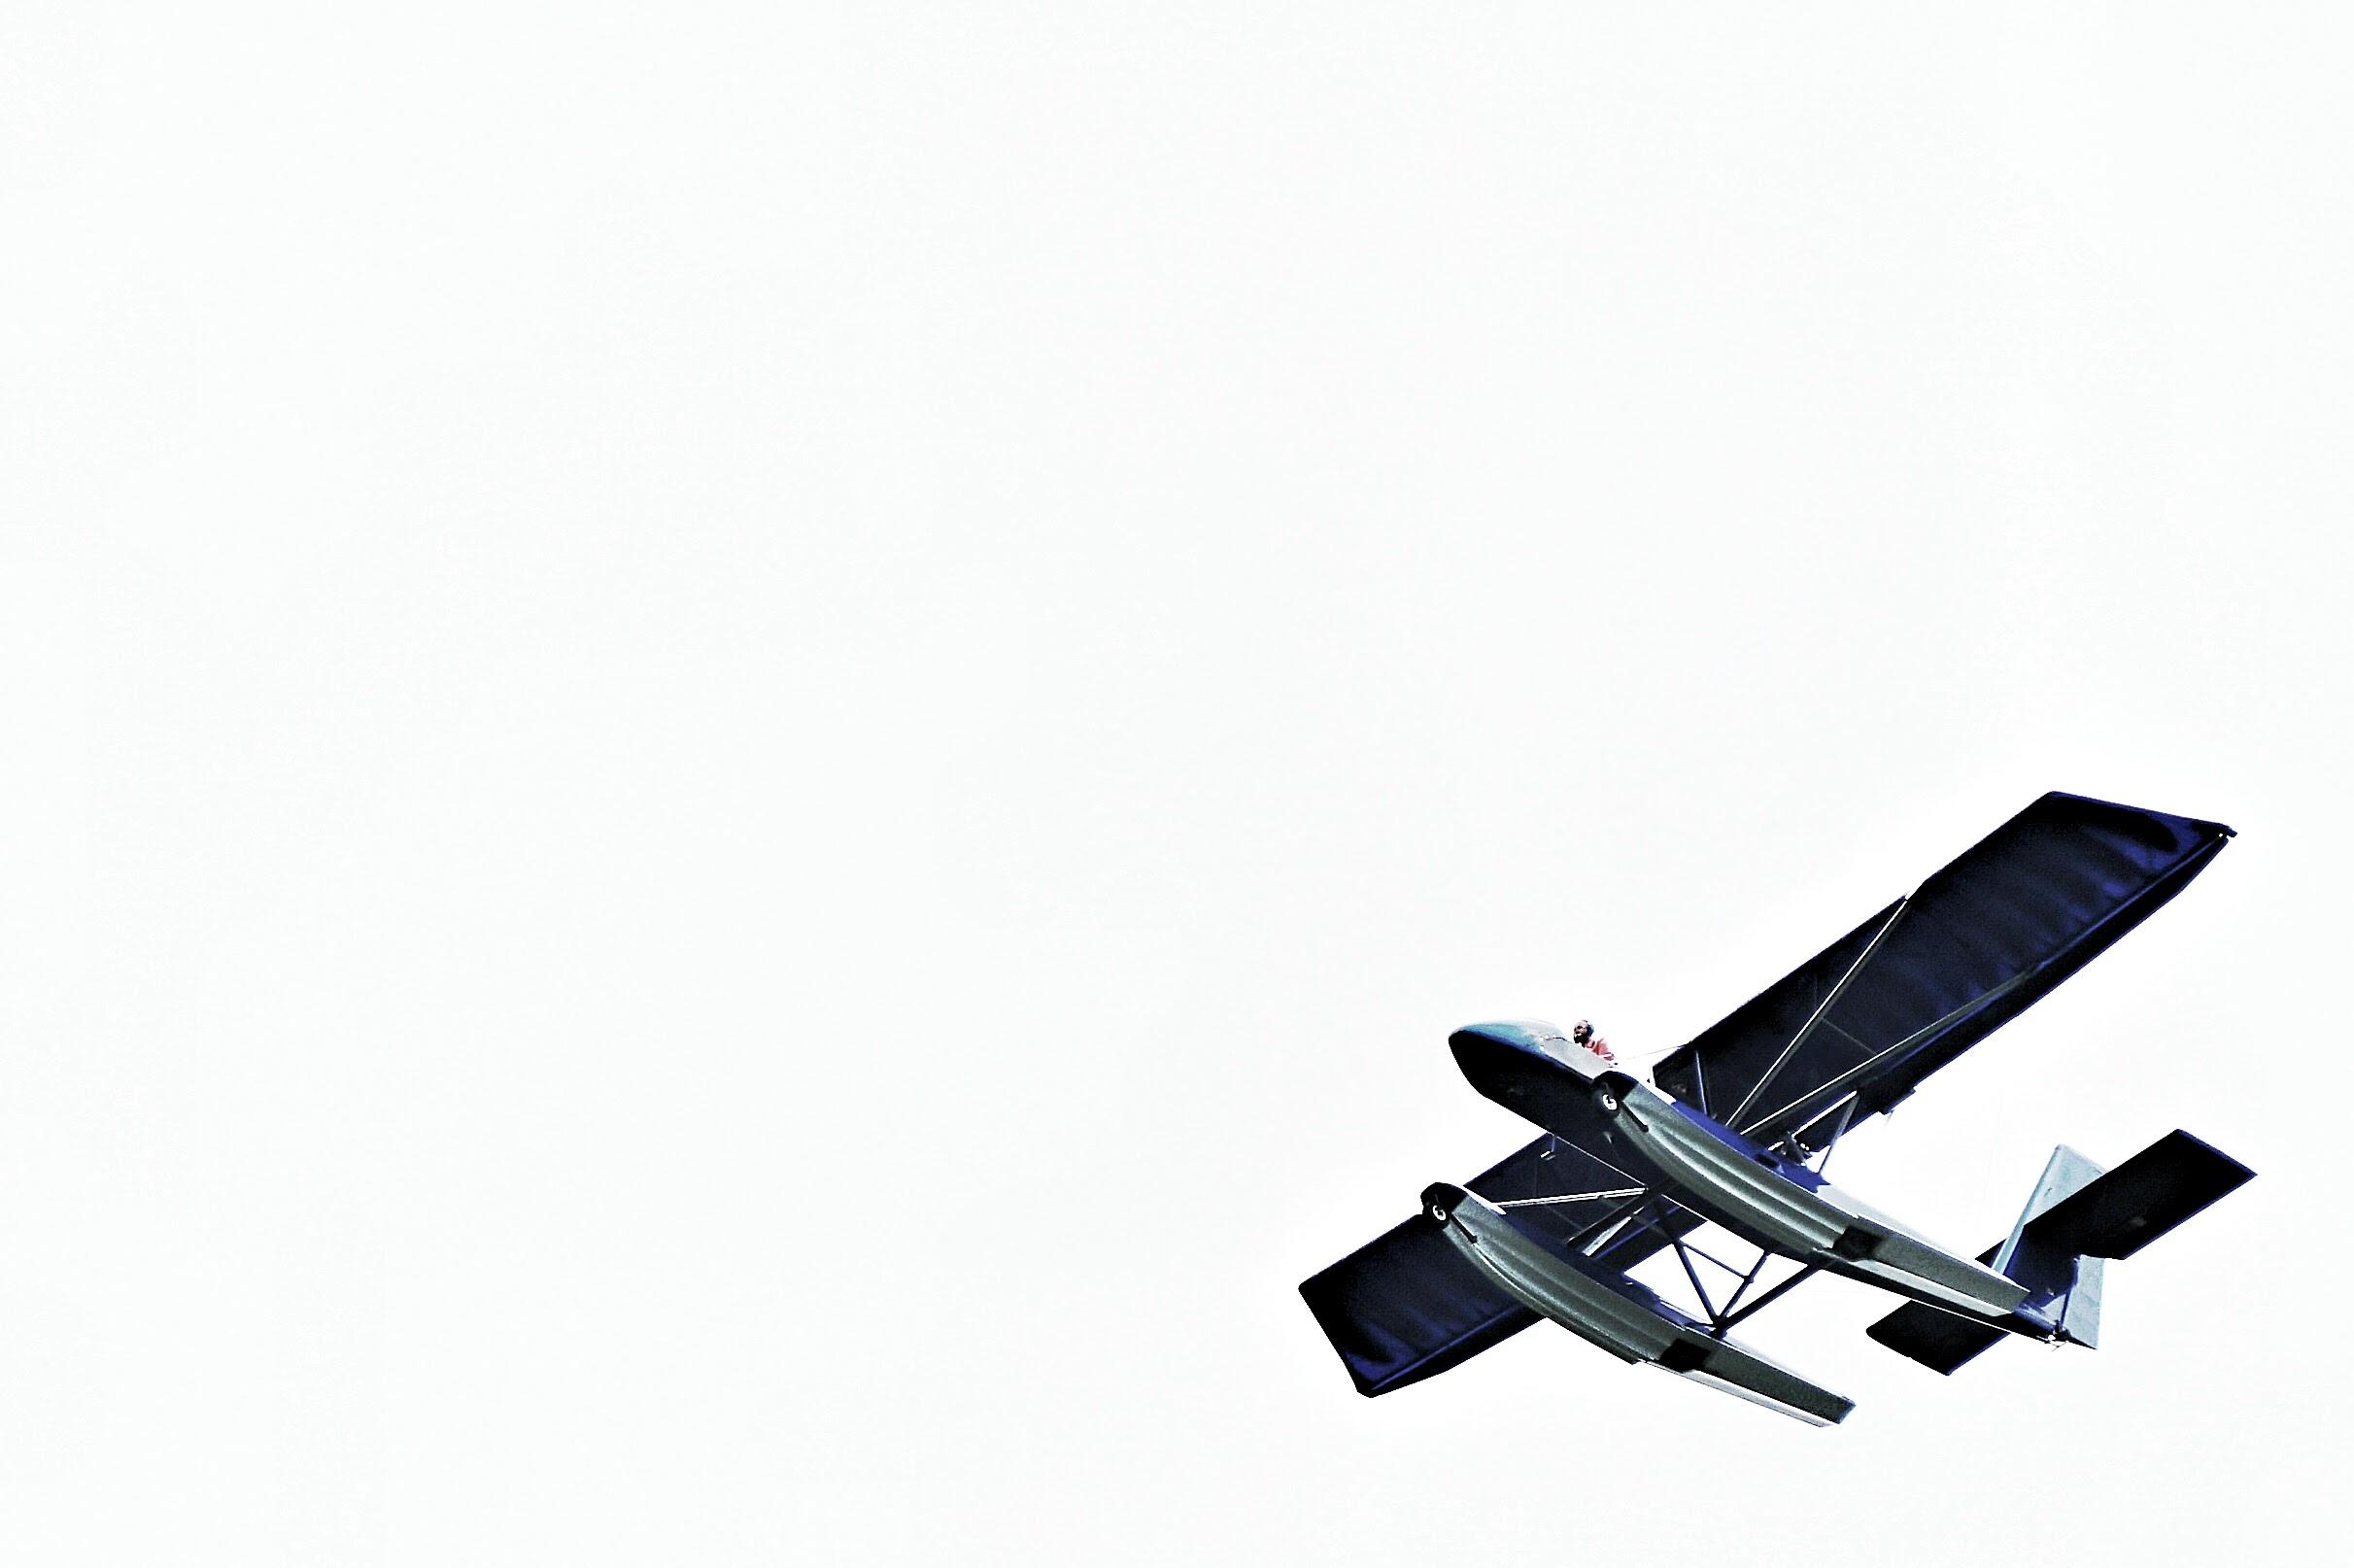 DSC02432-01.jpg